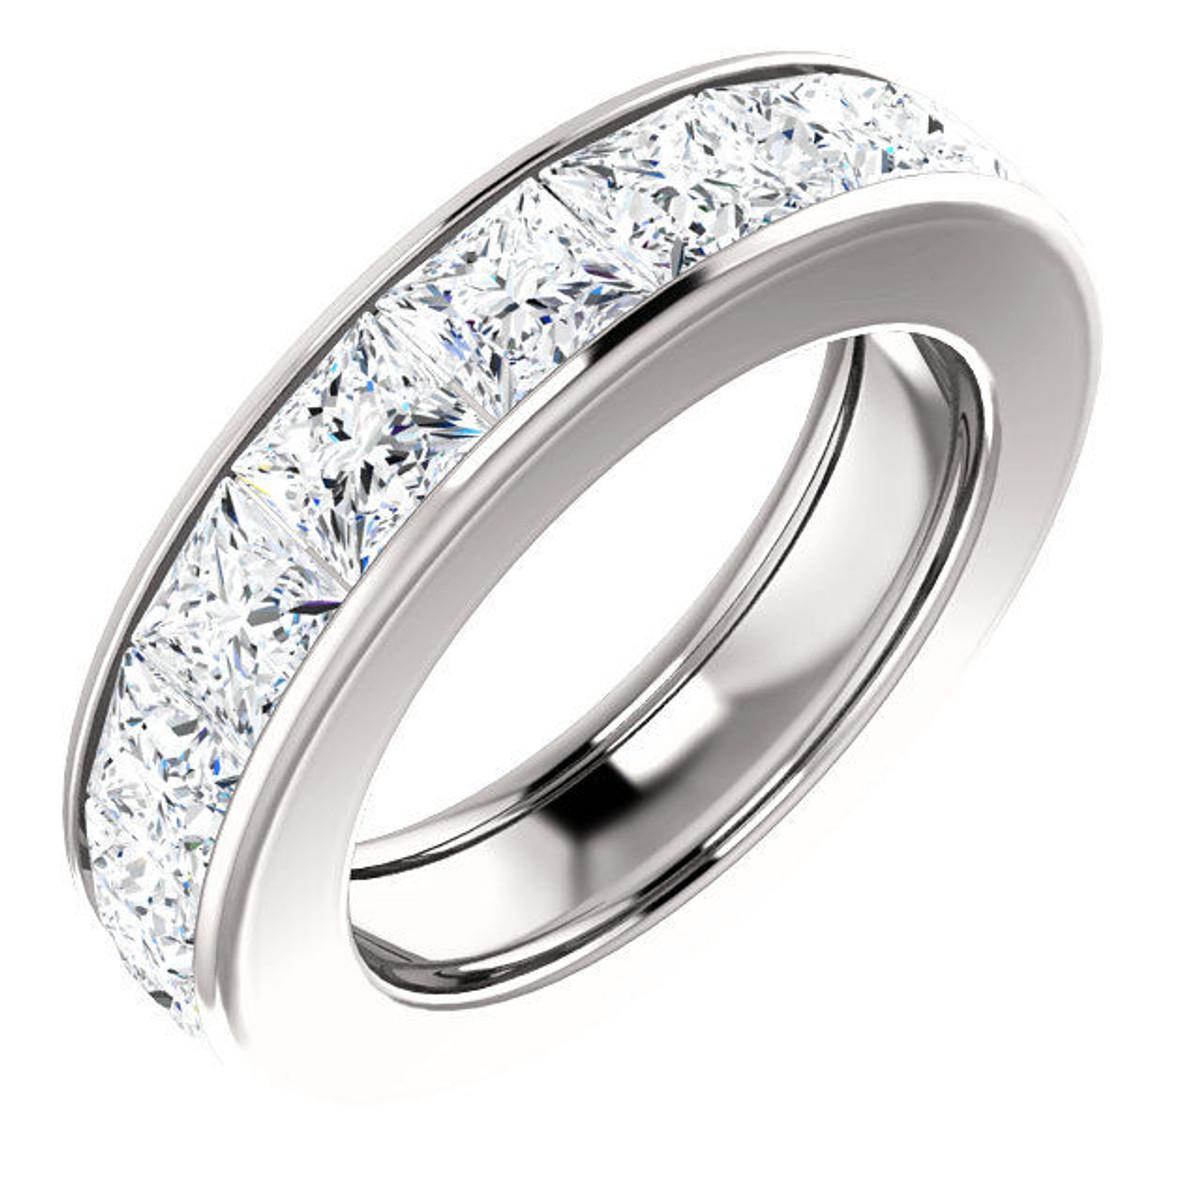 Platinum 7.2 ct tw Princess Cut Diamond Eternity Ring